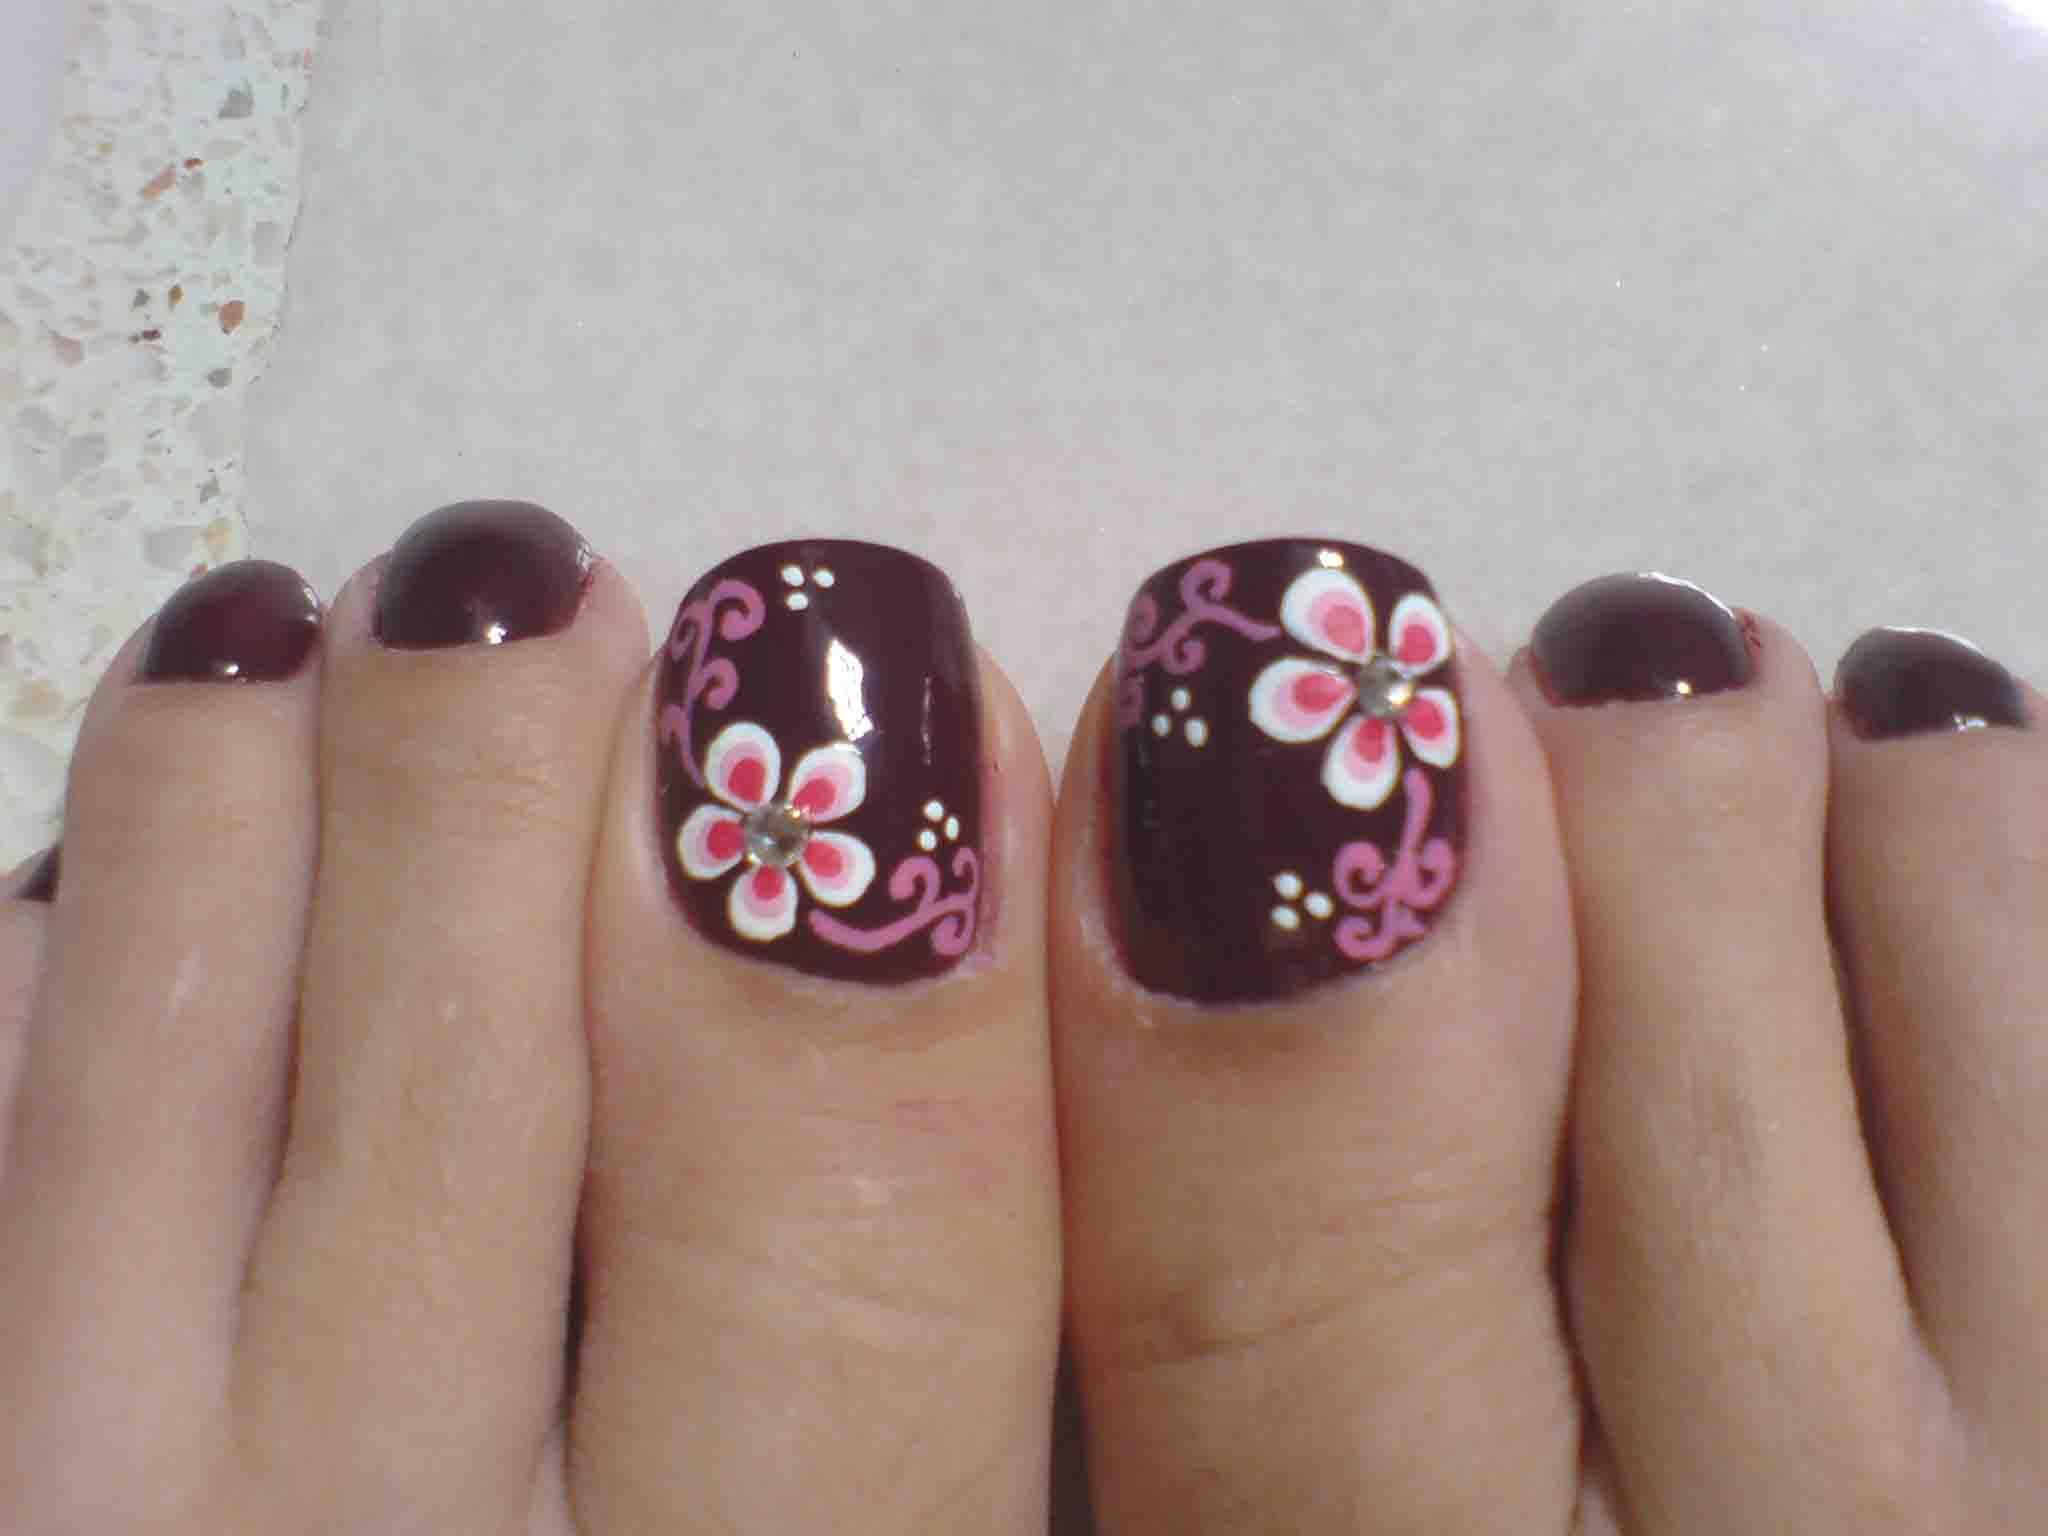 Pin von Janes Place Home Daycare auf Handpainted nail art | Pinterest